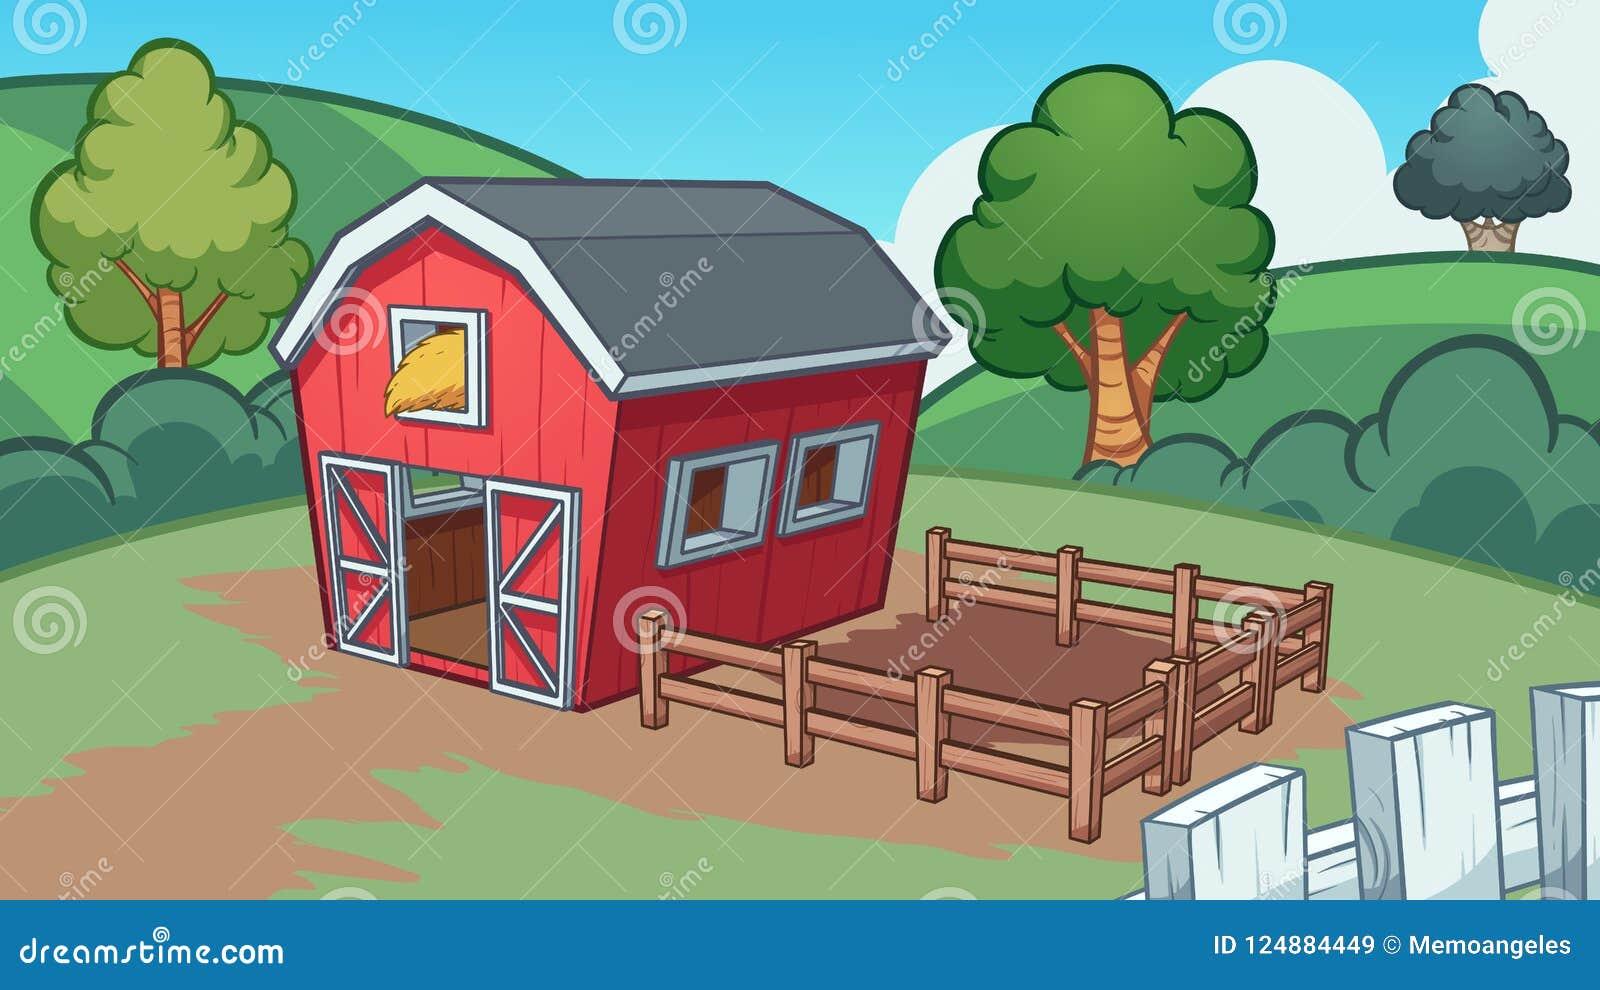 Cartoon Farm With Red Barn Stock Vector Illustration Of